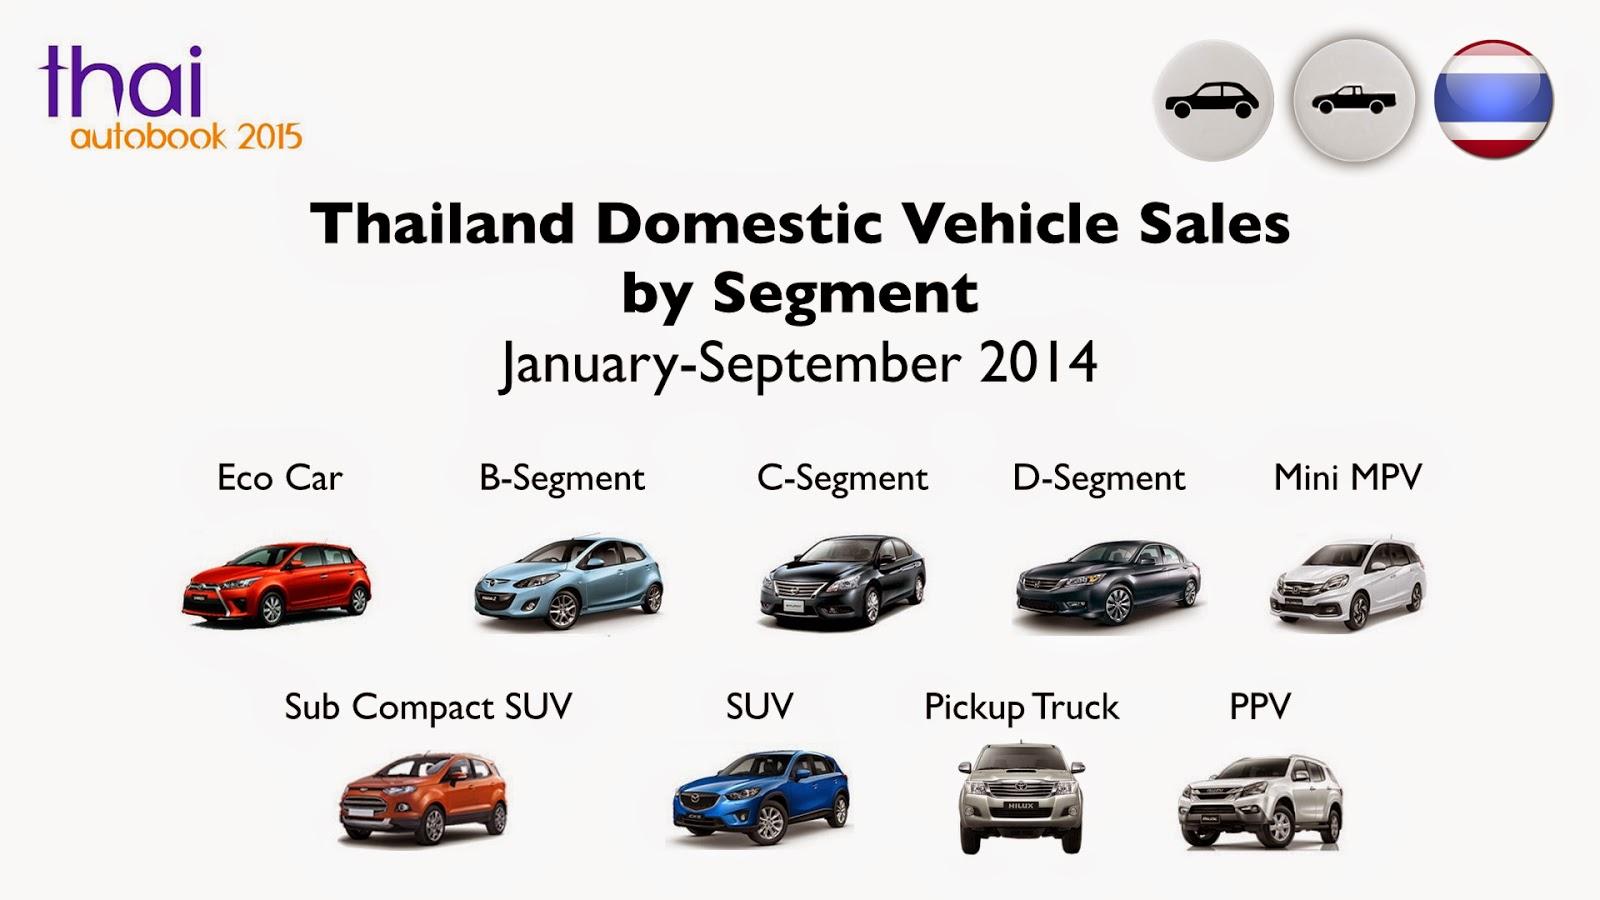 thailand autobook premiere new statistics for thailand automotive sales by segment model. Black Bedroom Furniture Sets. Home Design Ideas